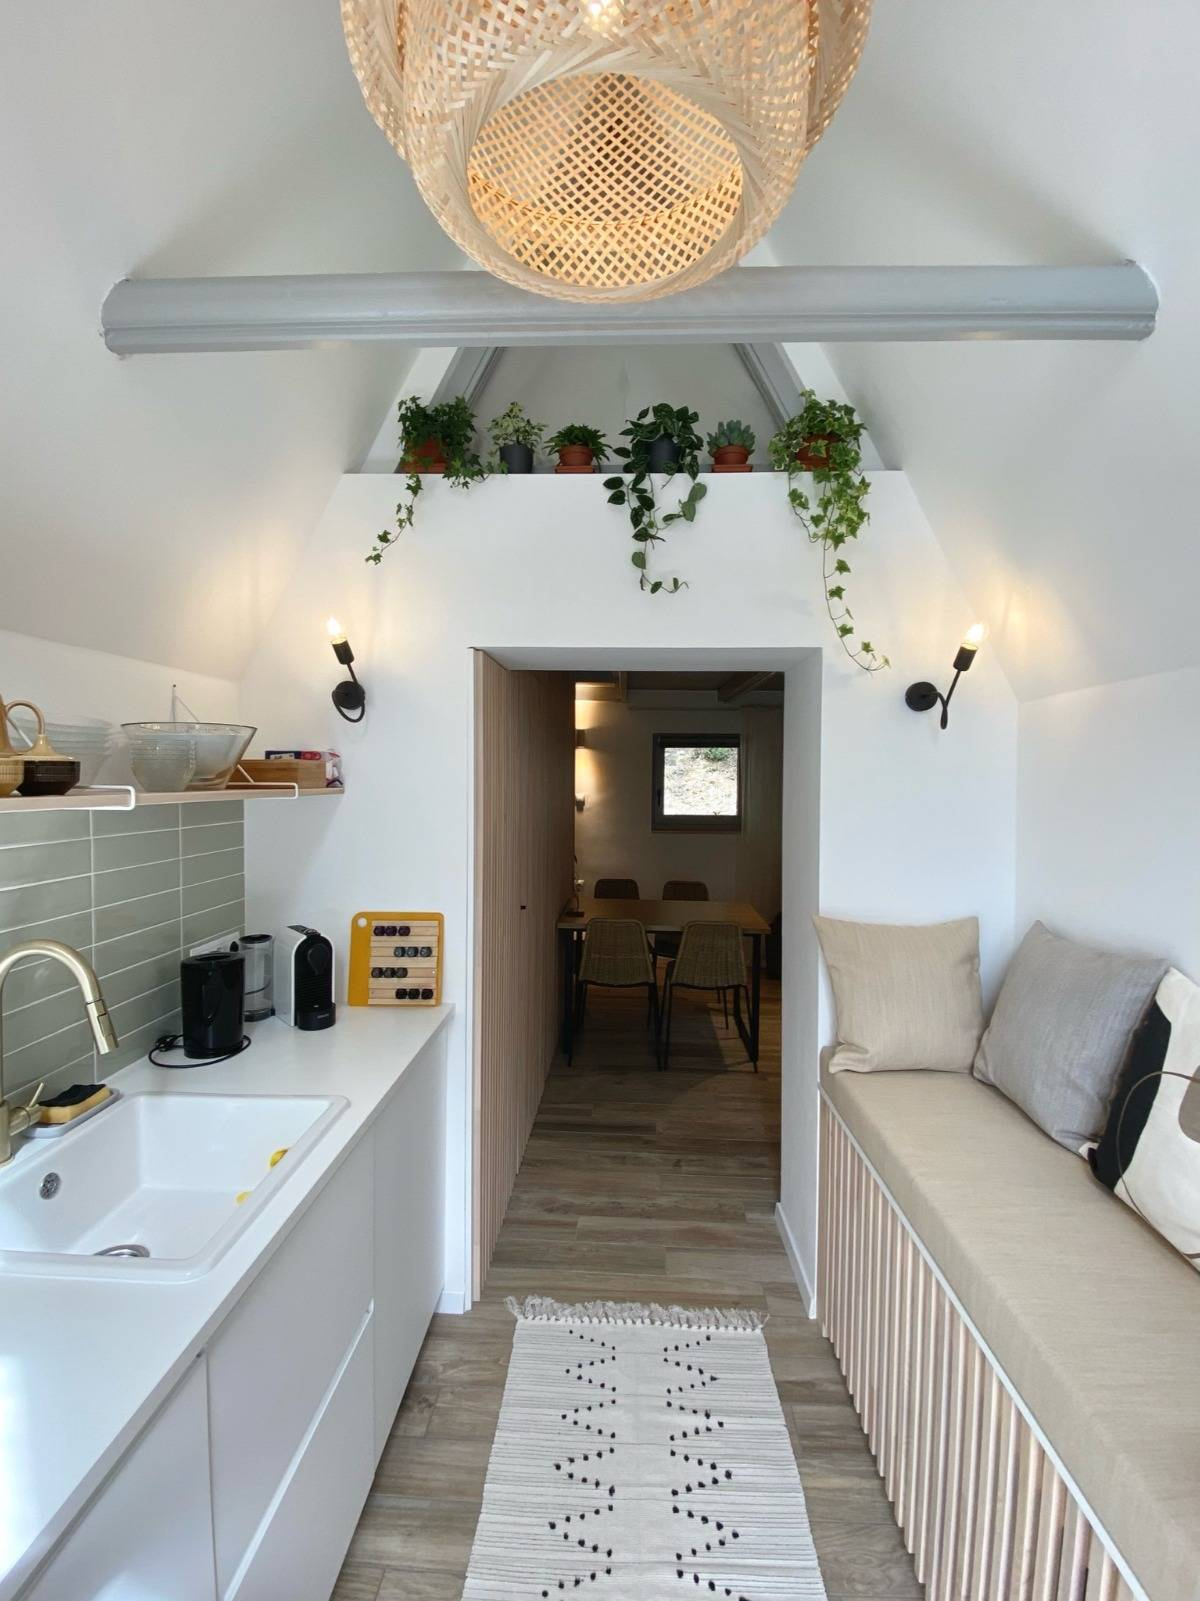 konyha, kabin, szürke konyha, szőnyegg